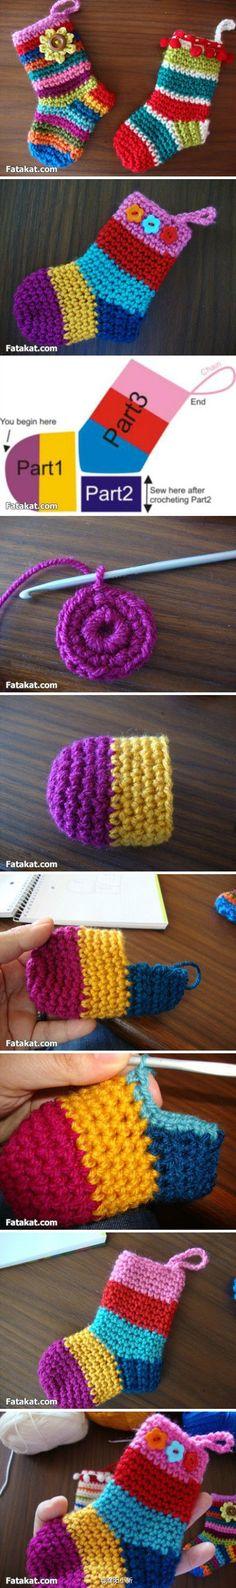 diy-crochet-baby-stocking Baby Stocking, Crochet Stocking, Crochet Borders, Crochet Stitches, Crochet Patterns, Crochet Designs, Cute Crochet, Crochet For Kids, Crochet Crafts